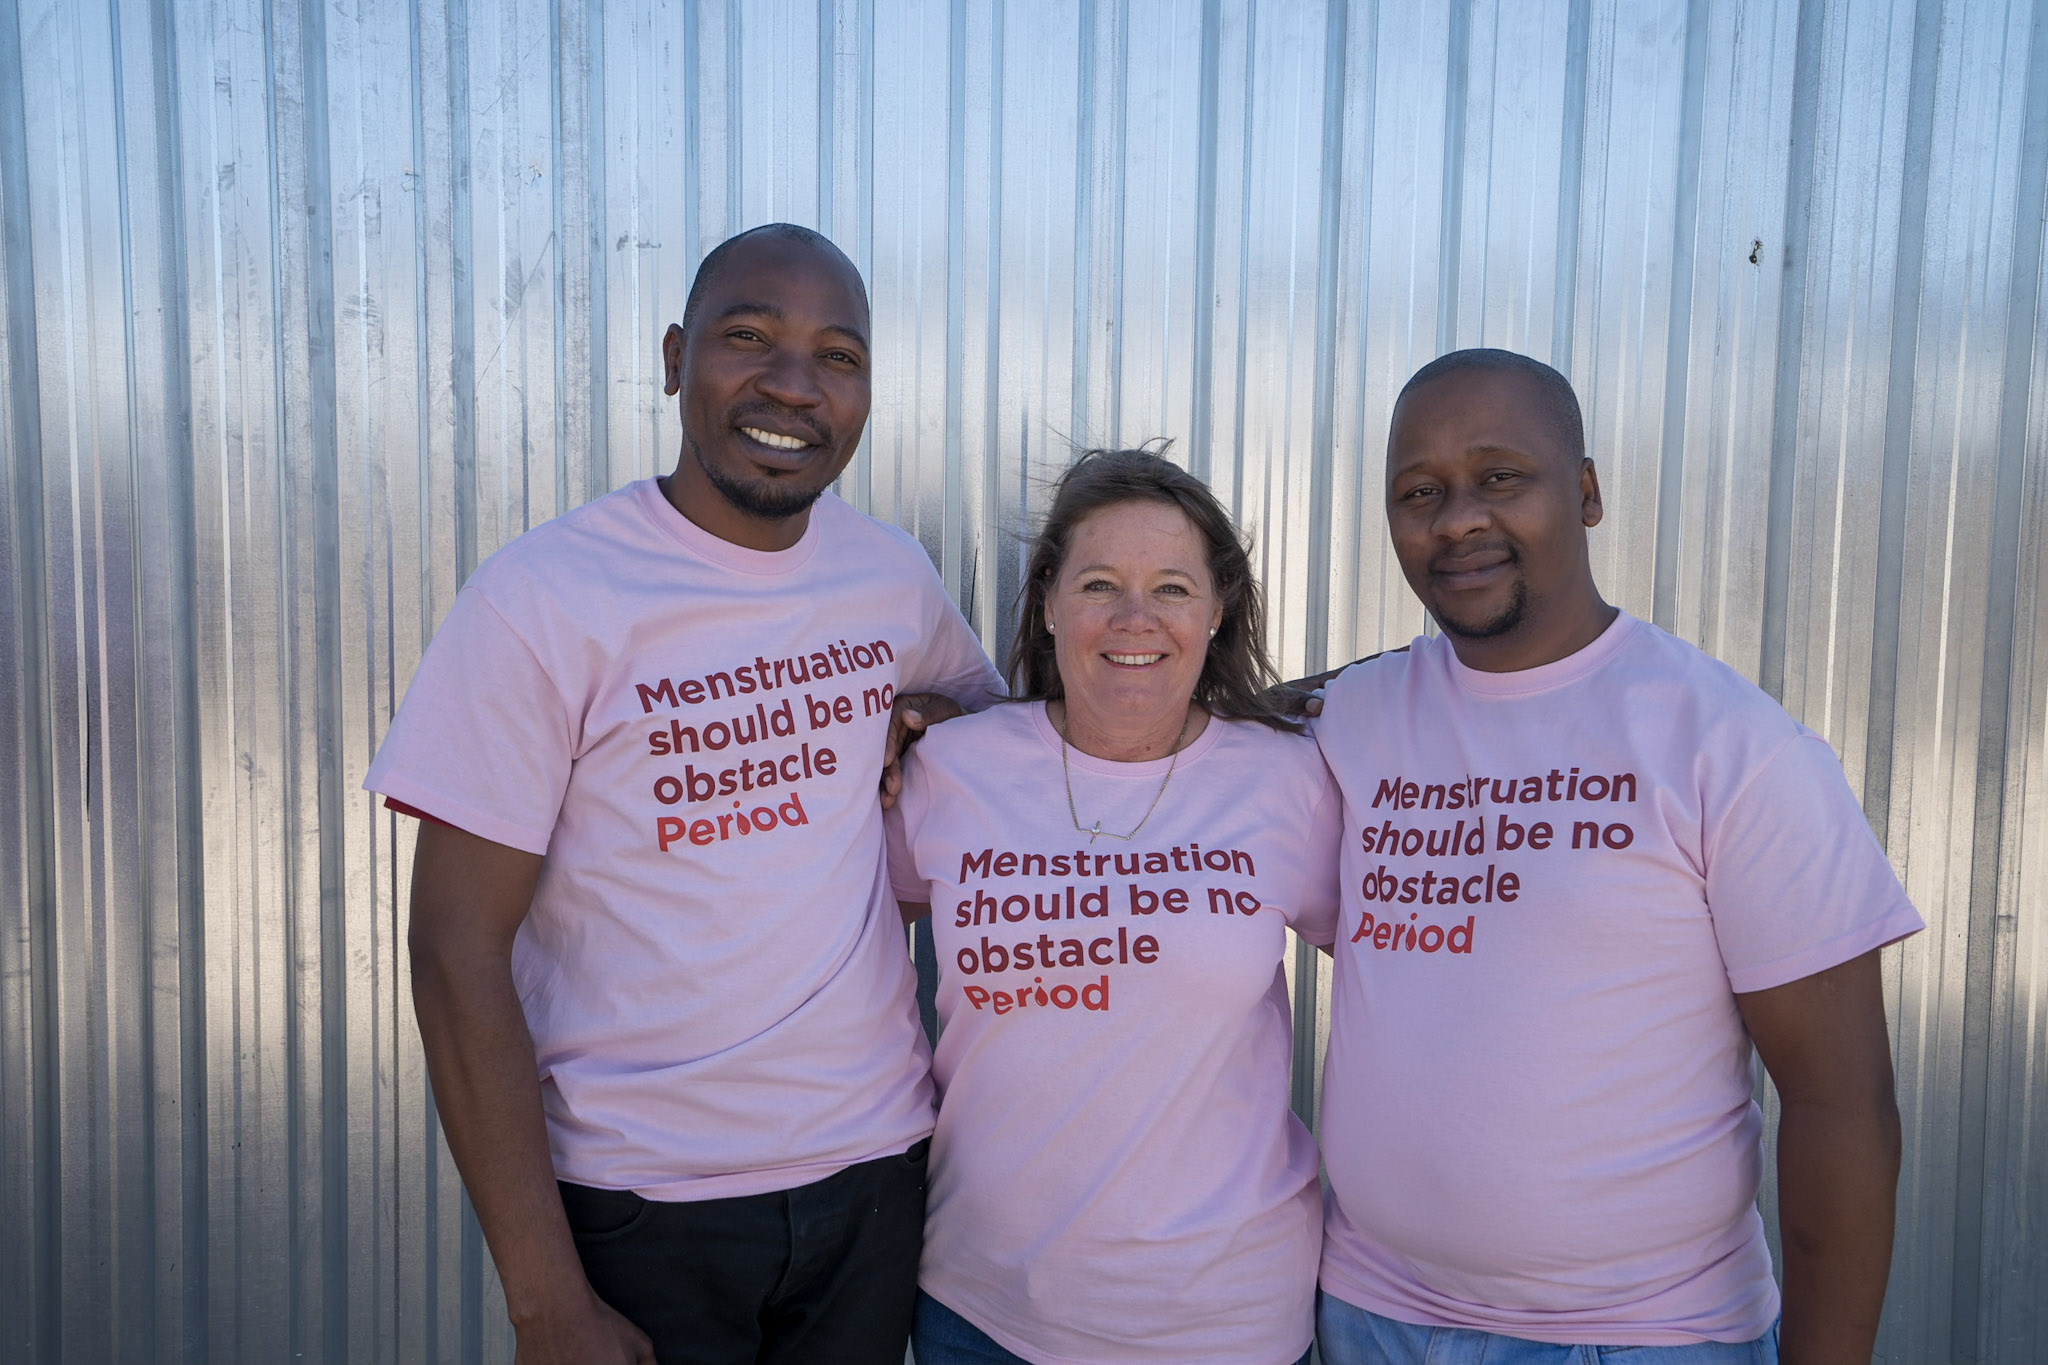 Taps M'nyati Sonke Gender Justice, Susan Barnes Project Dignity, Thulani Velebayi Sonke Gender Justice.